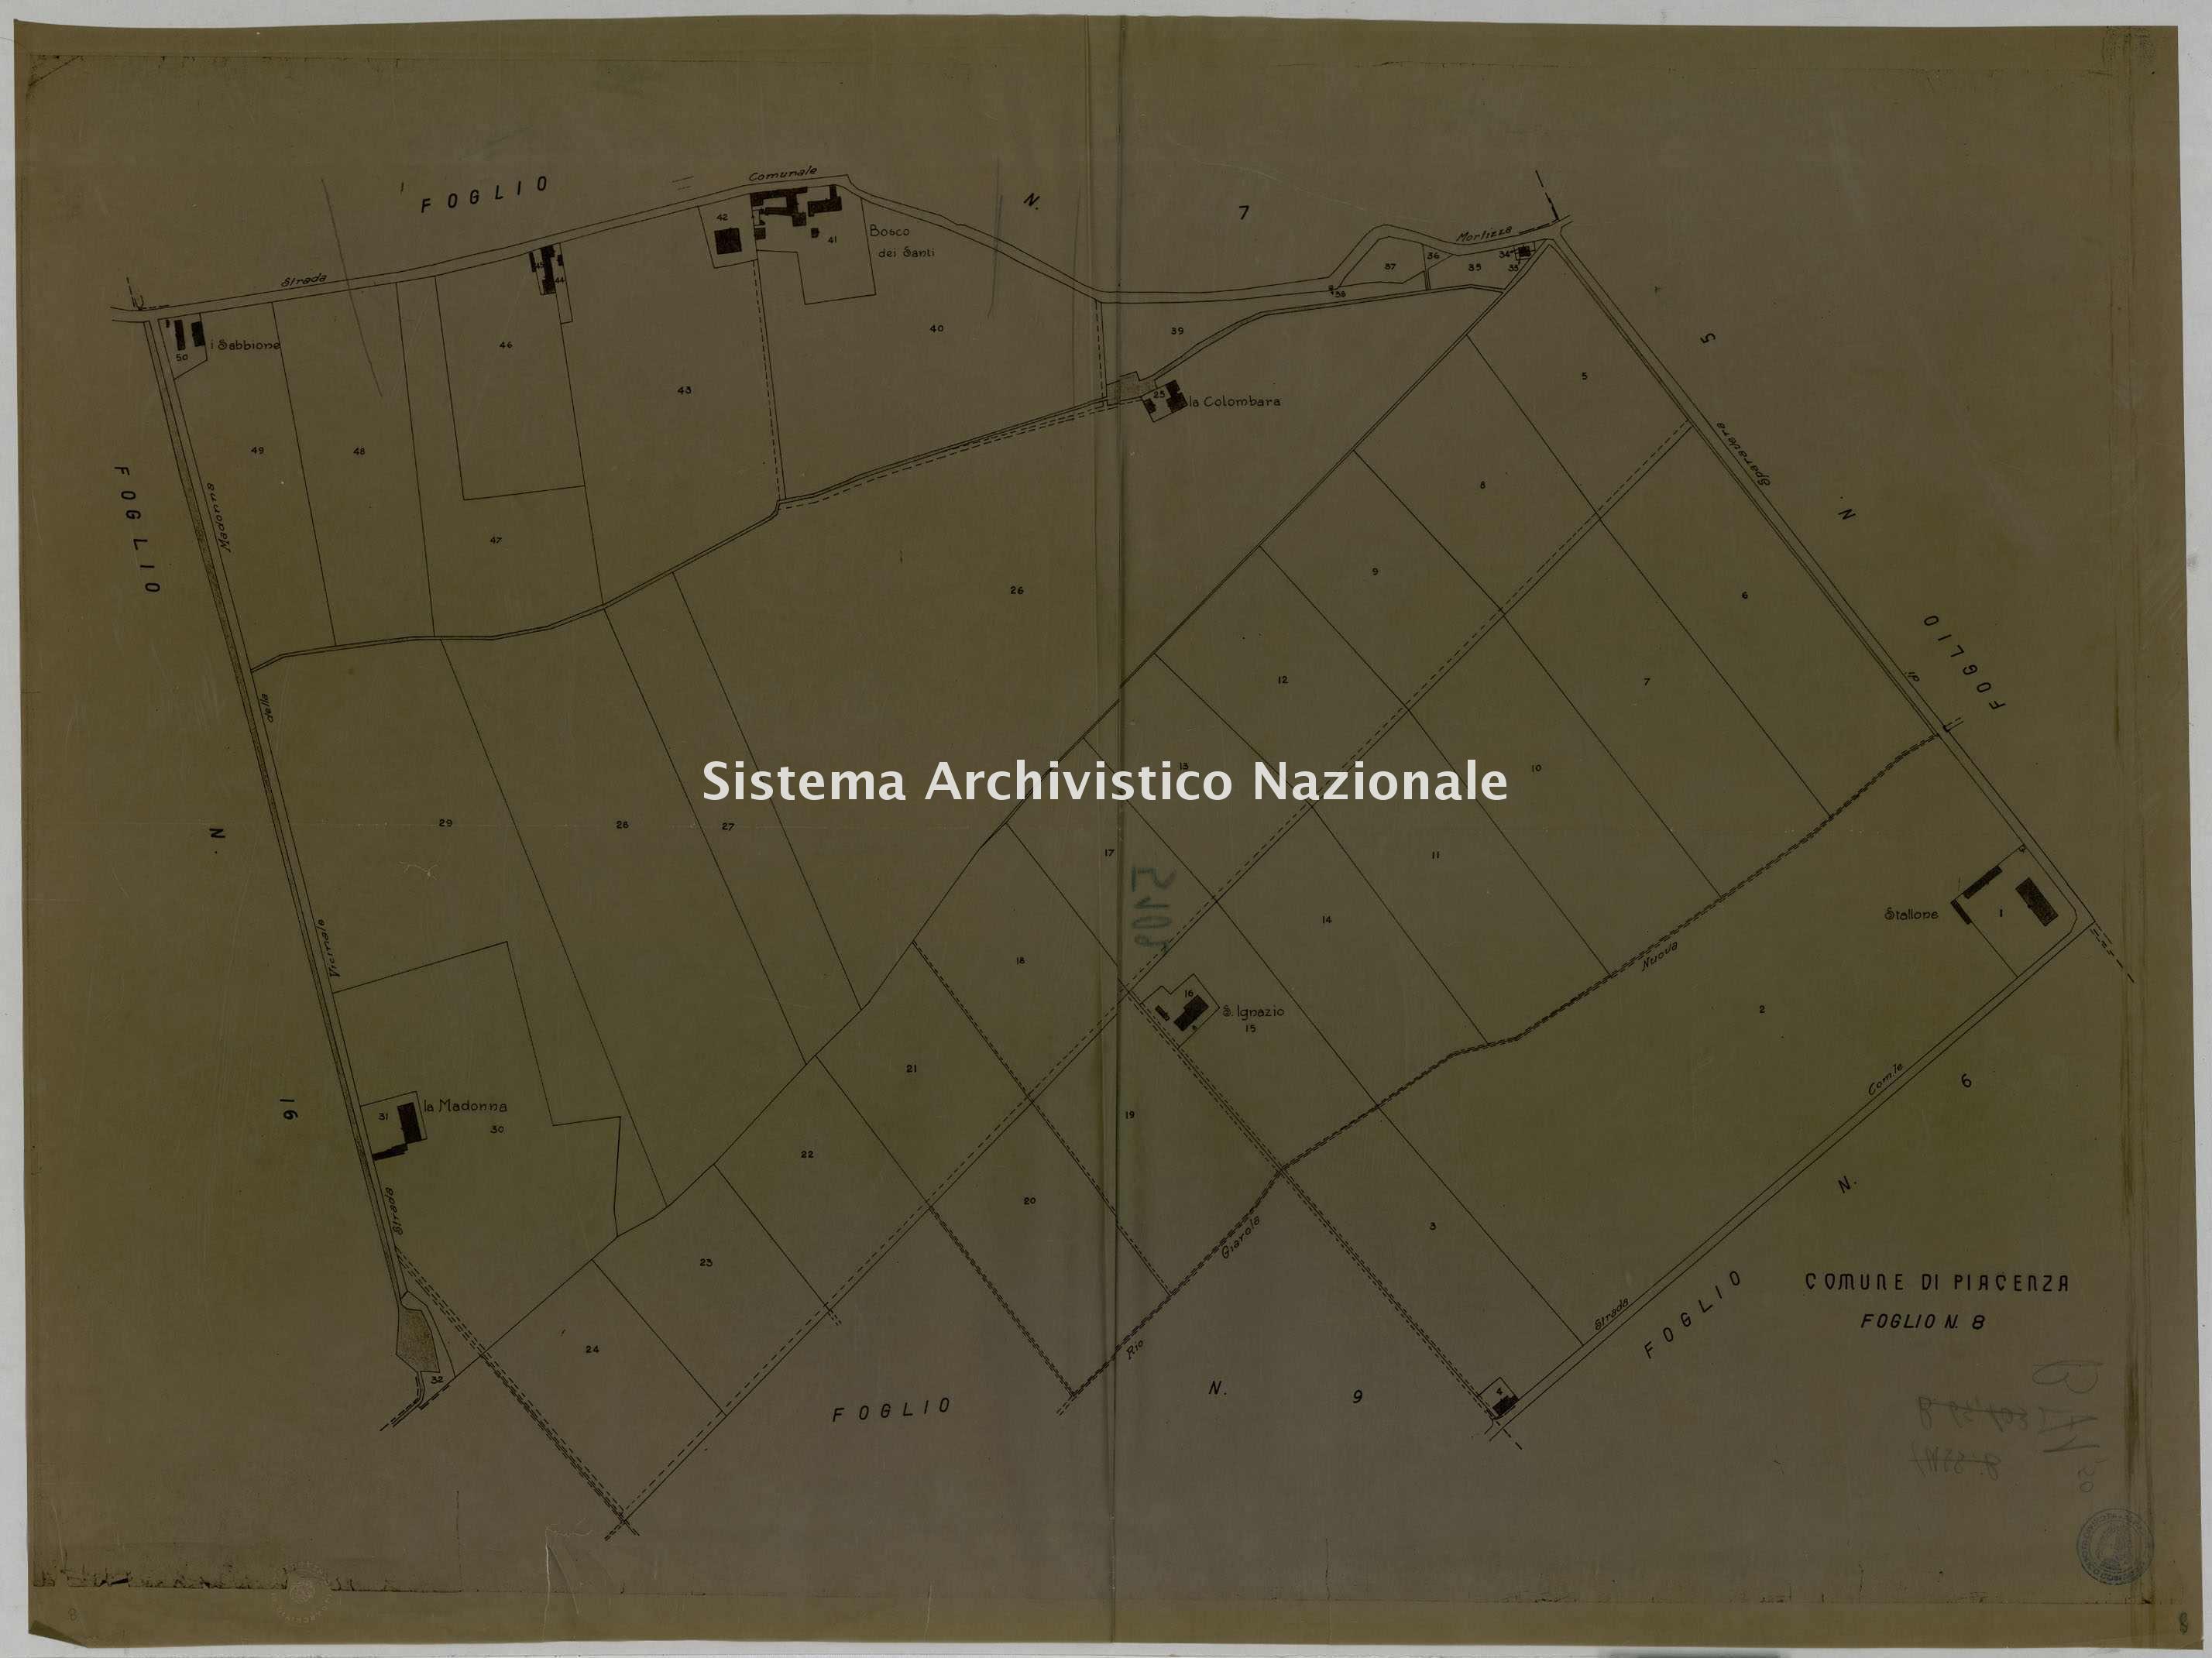 ASPC Mappe, stampe e disegni, n. 5102